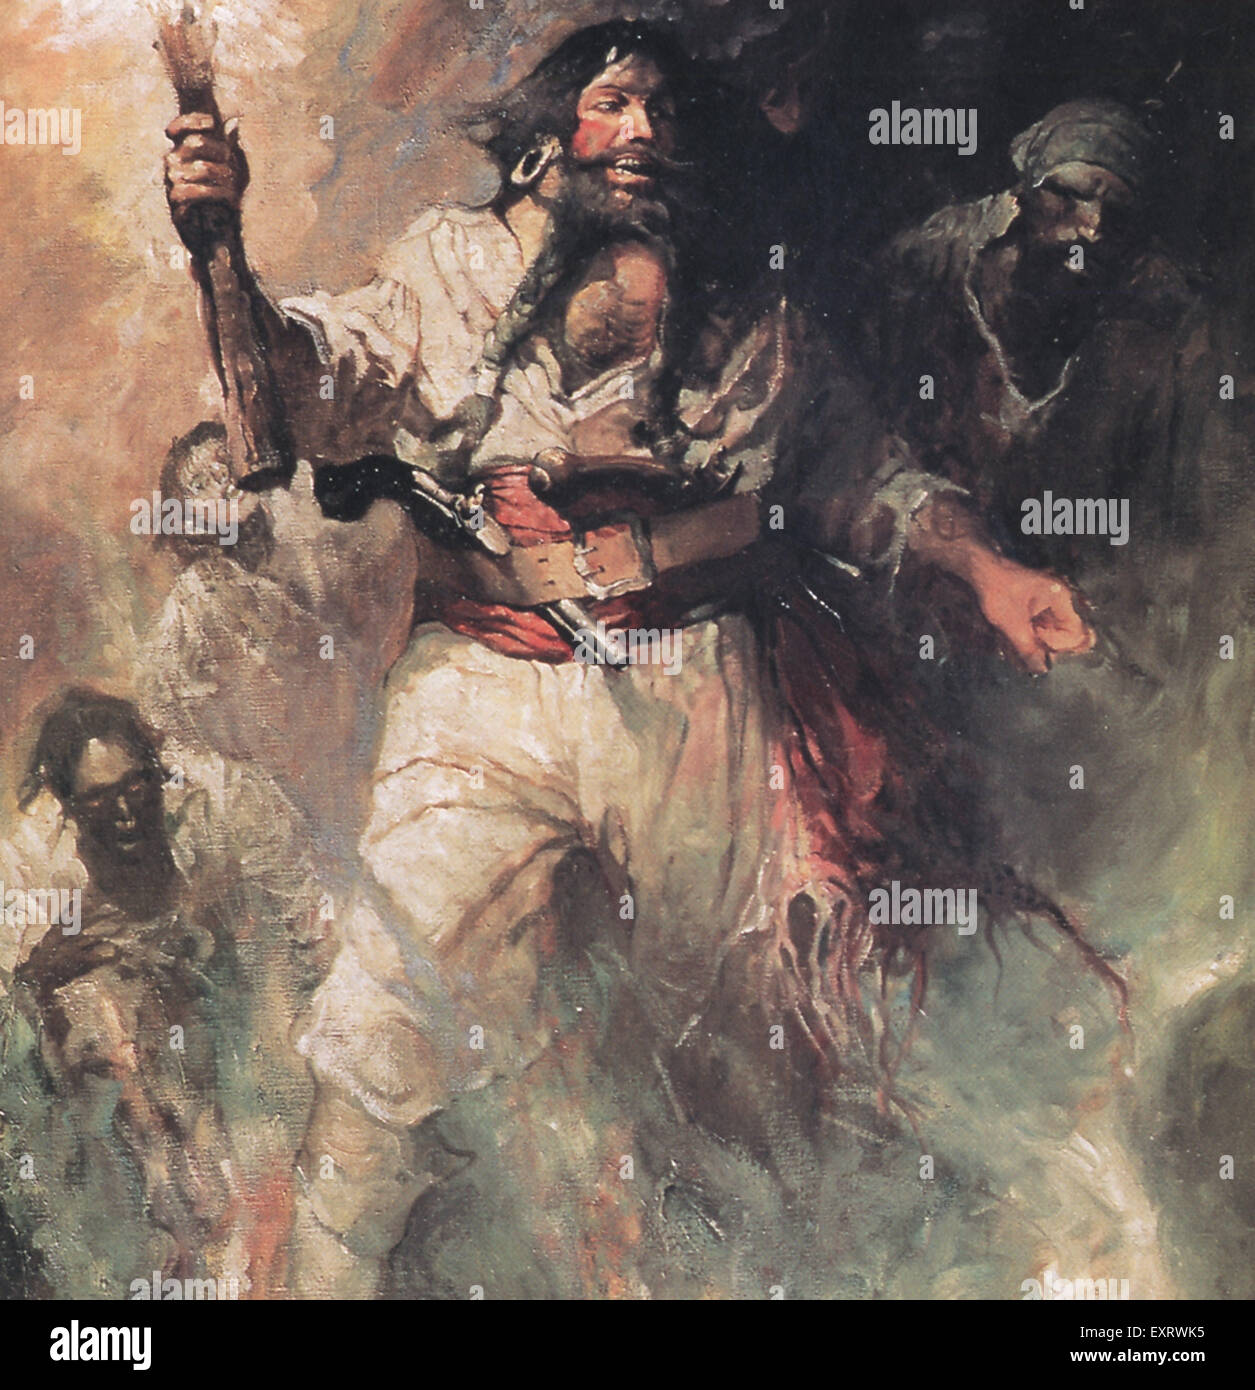 USA Pirates Book Plate - Stock Image